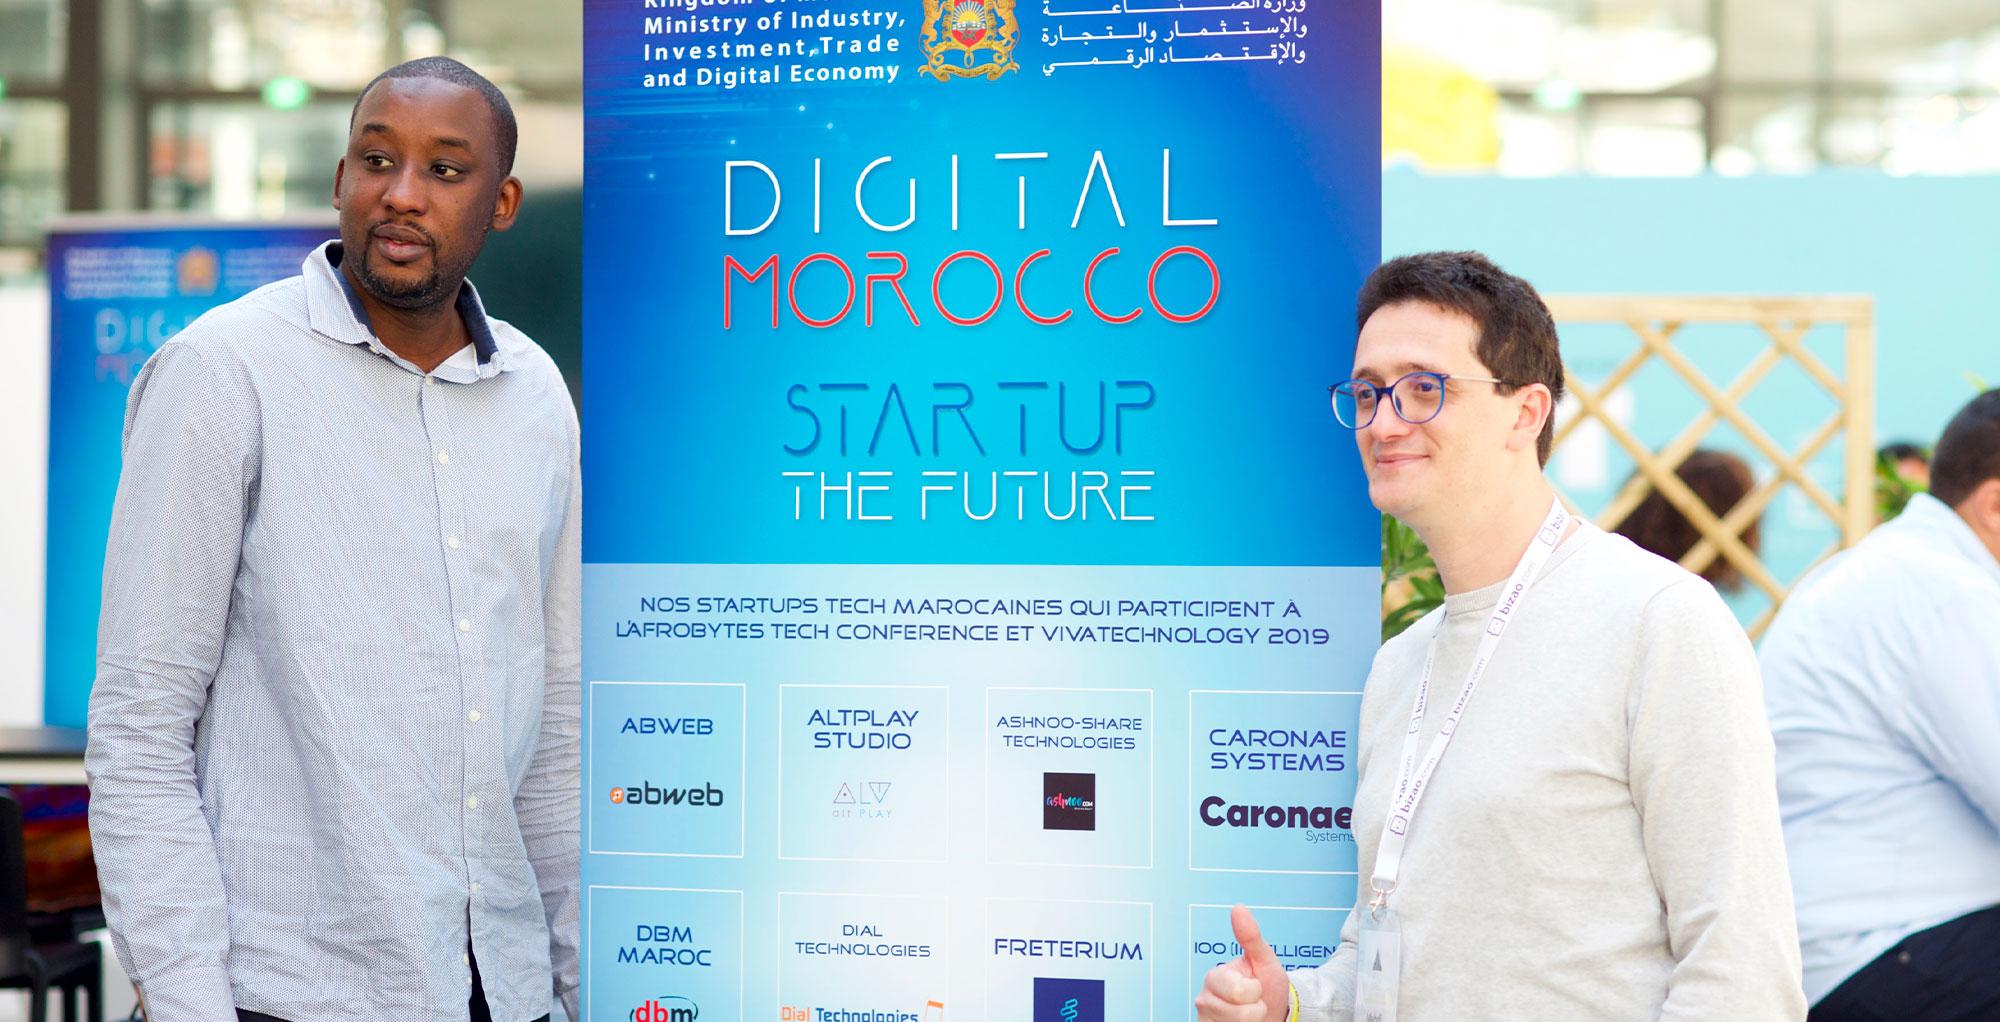 Digital Morocco